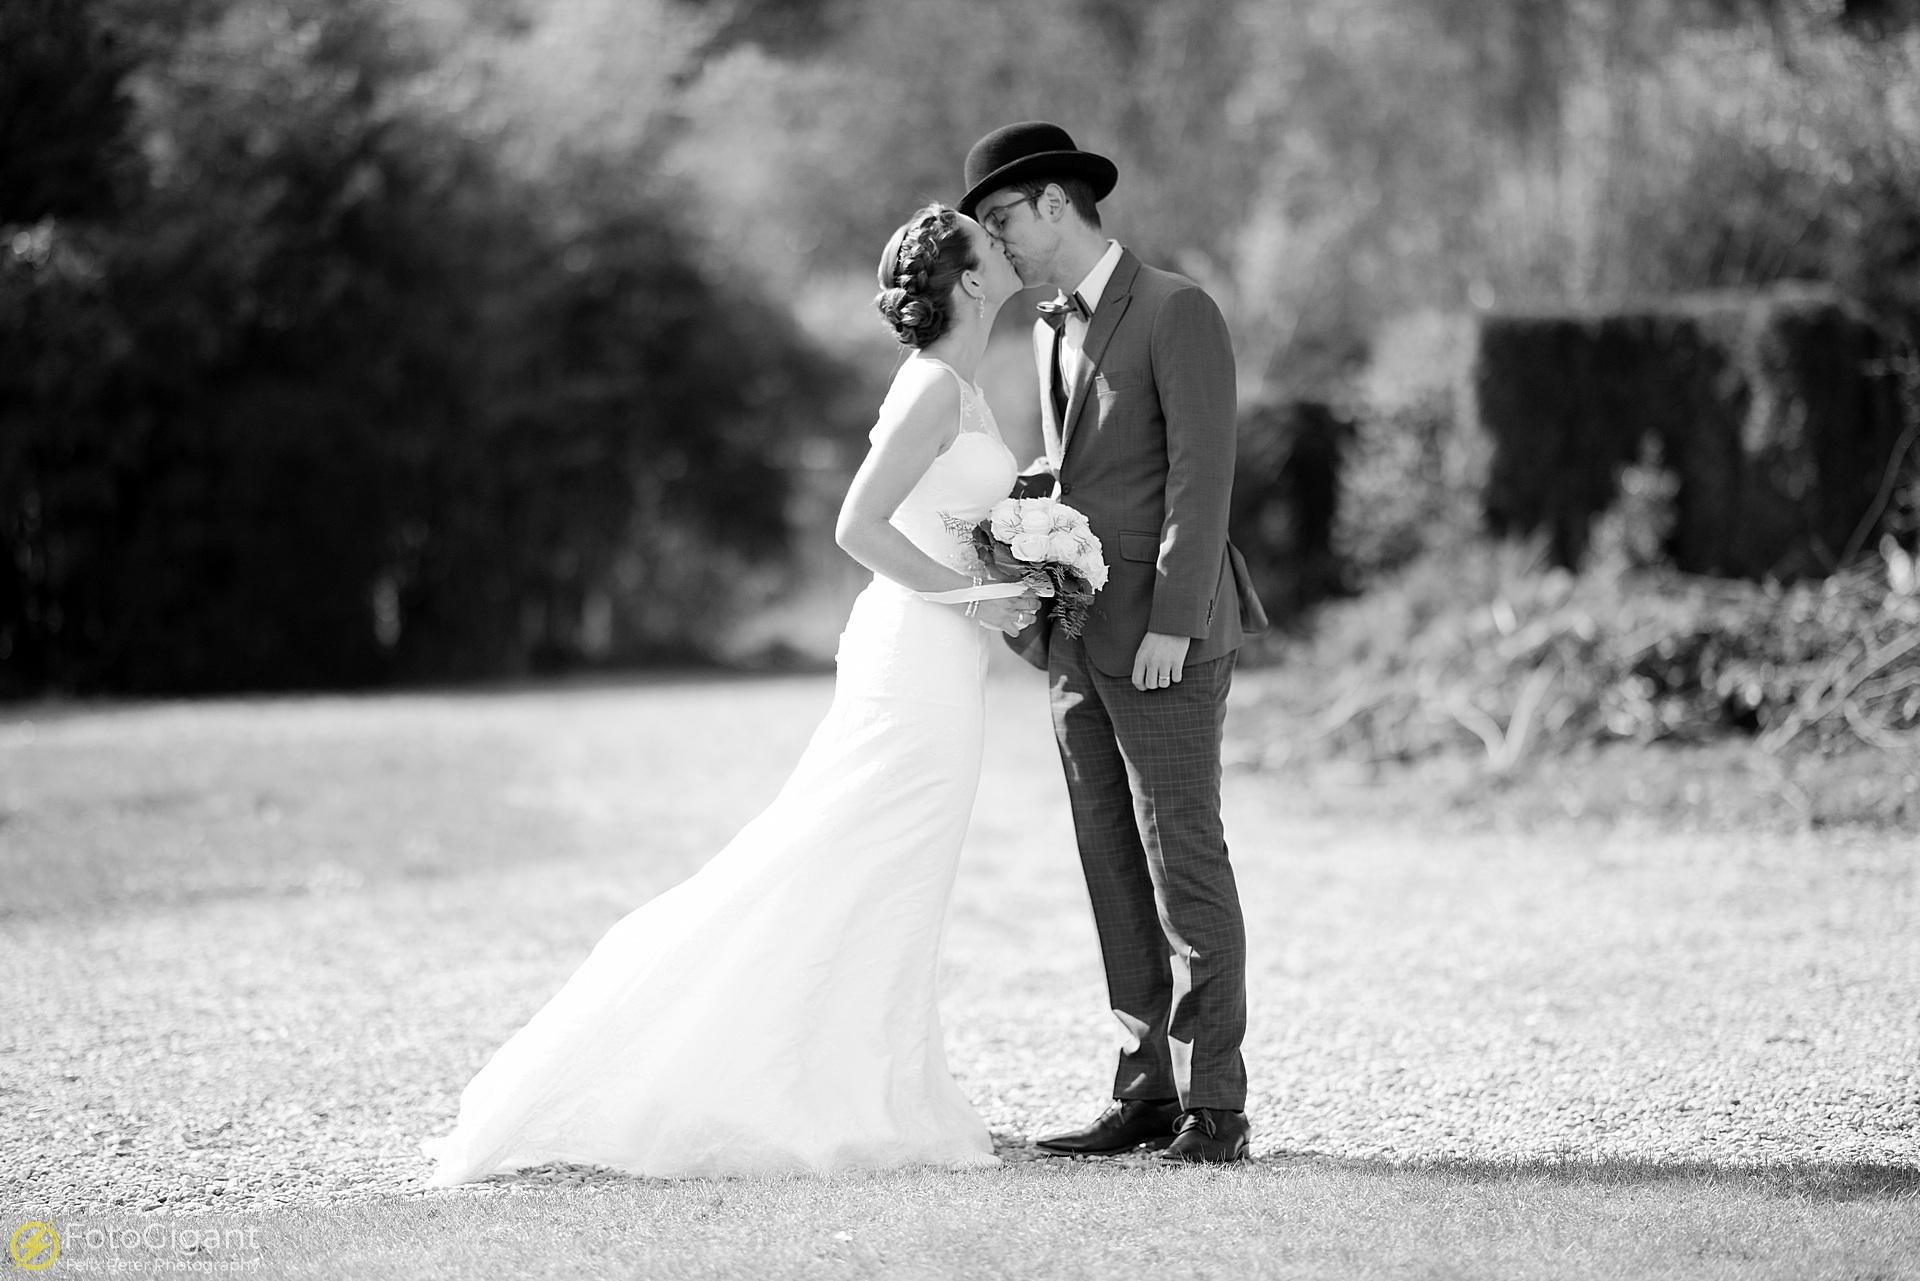 Hochzeitsfotografiekurs_Fotograf_Felix_Peter_17.jpg